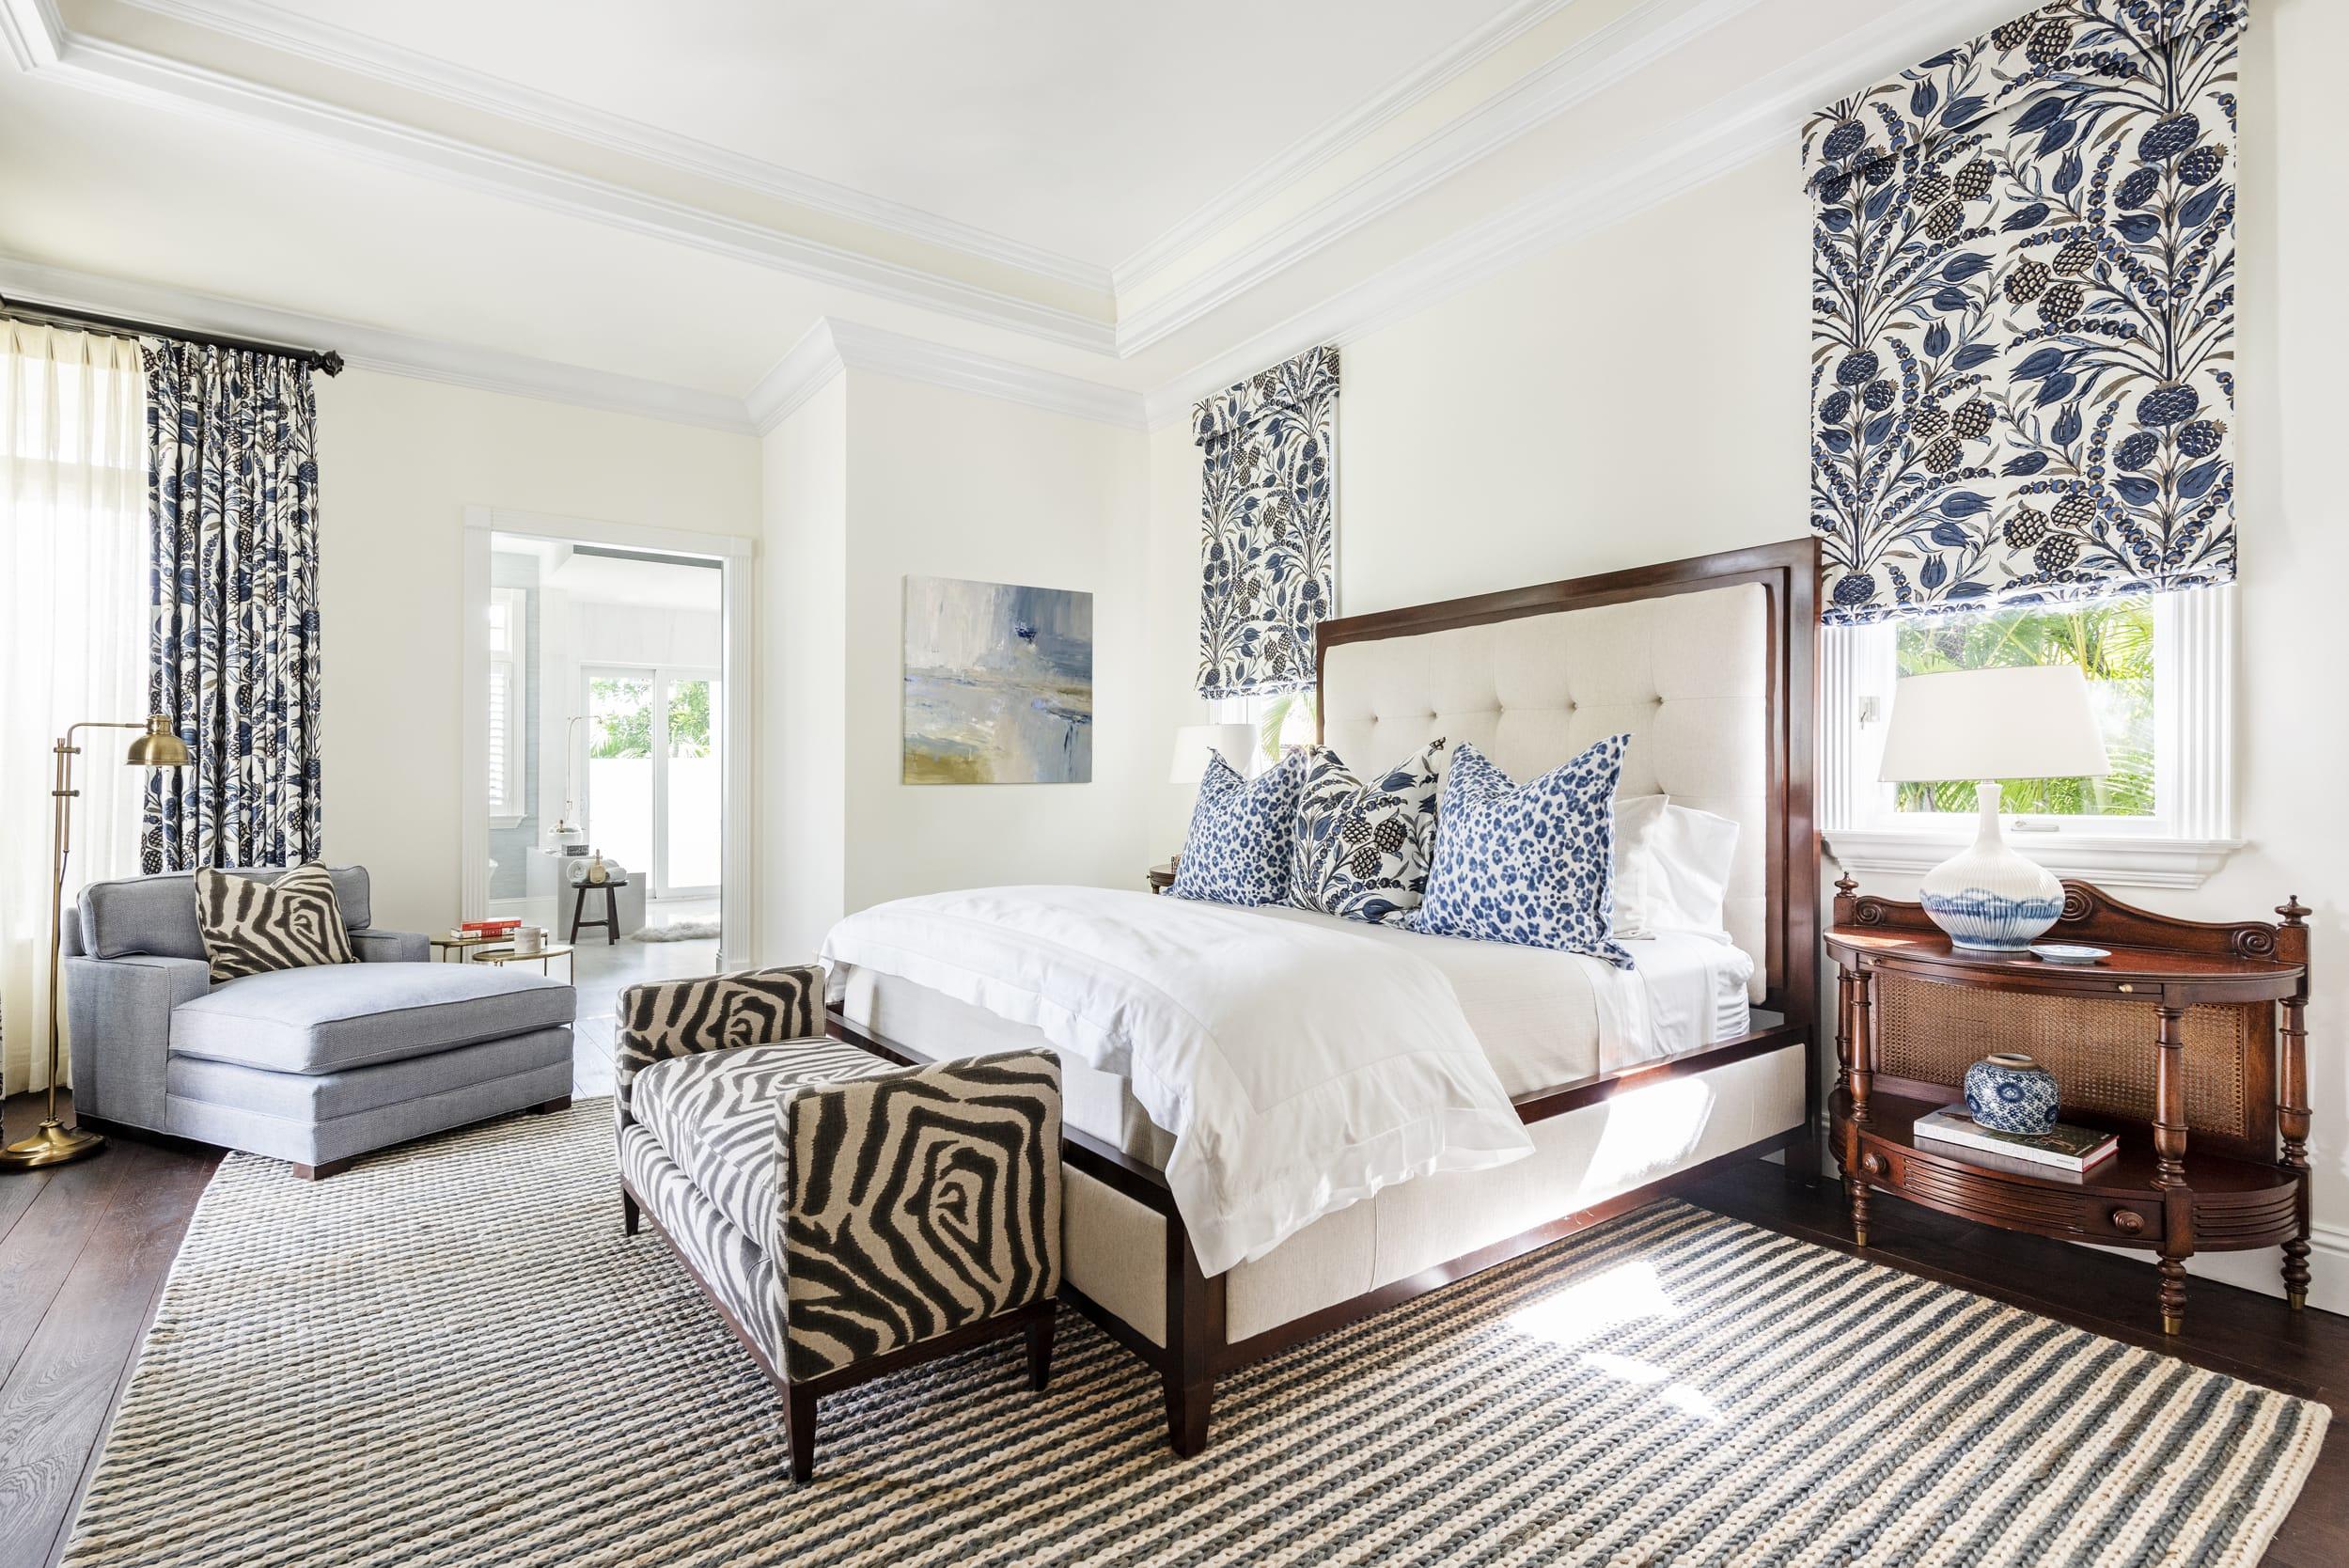 Jeffrey Fisher Home West Indies Styled Master Bedroom Dark Wood